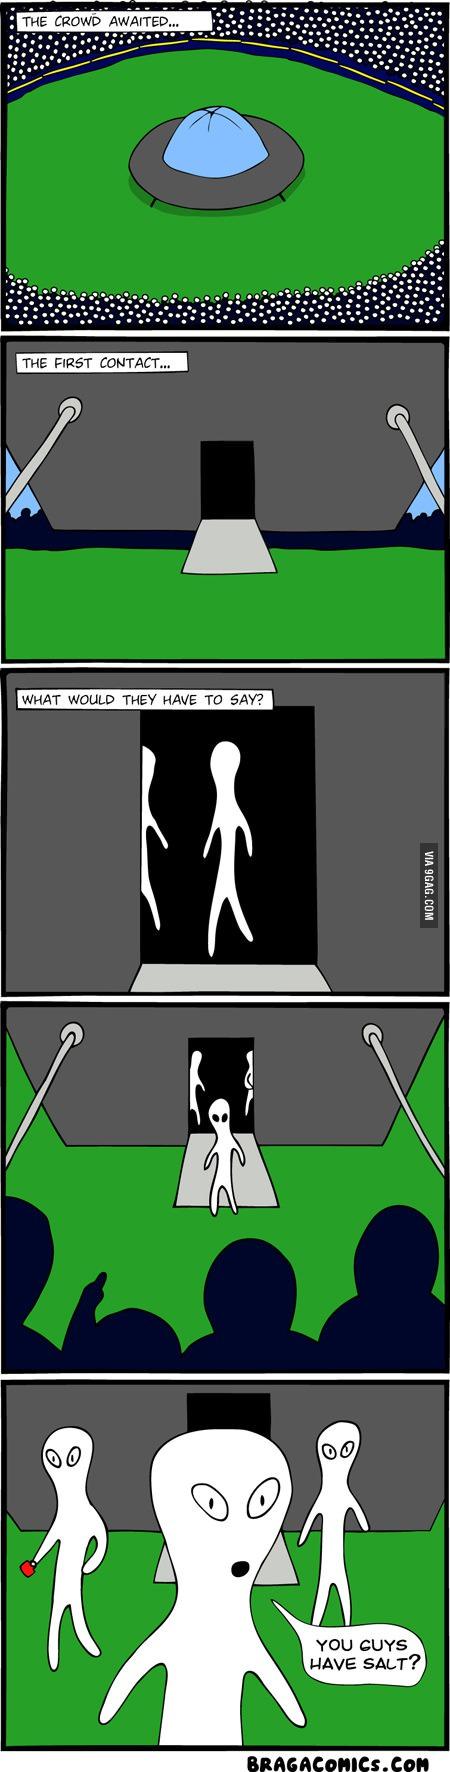 Aliens: You guys have salt?